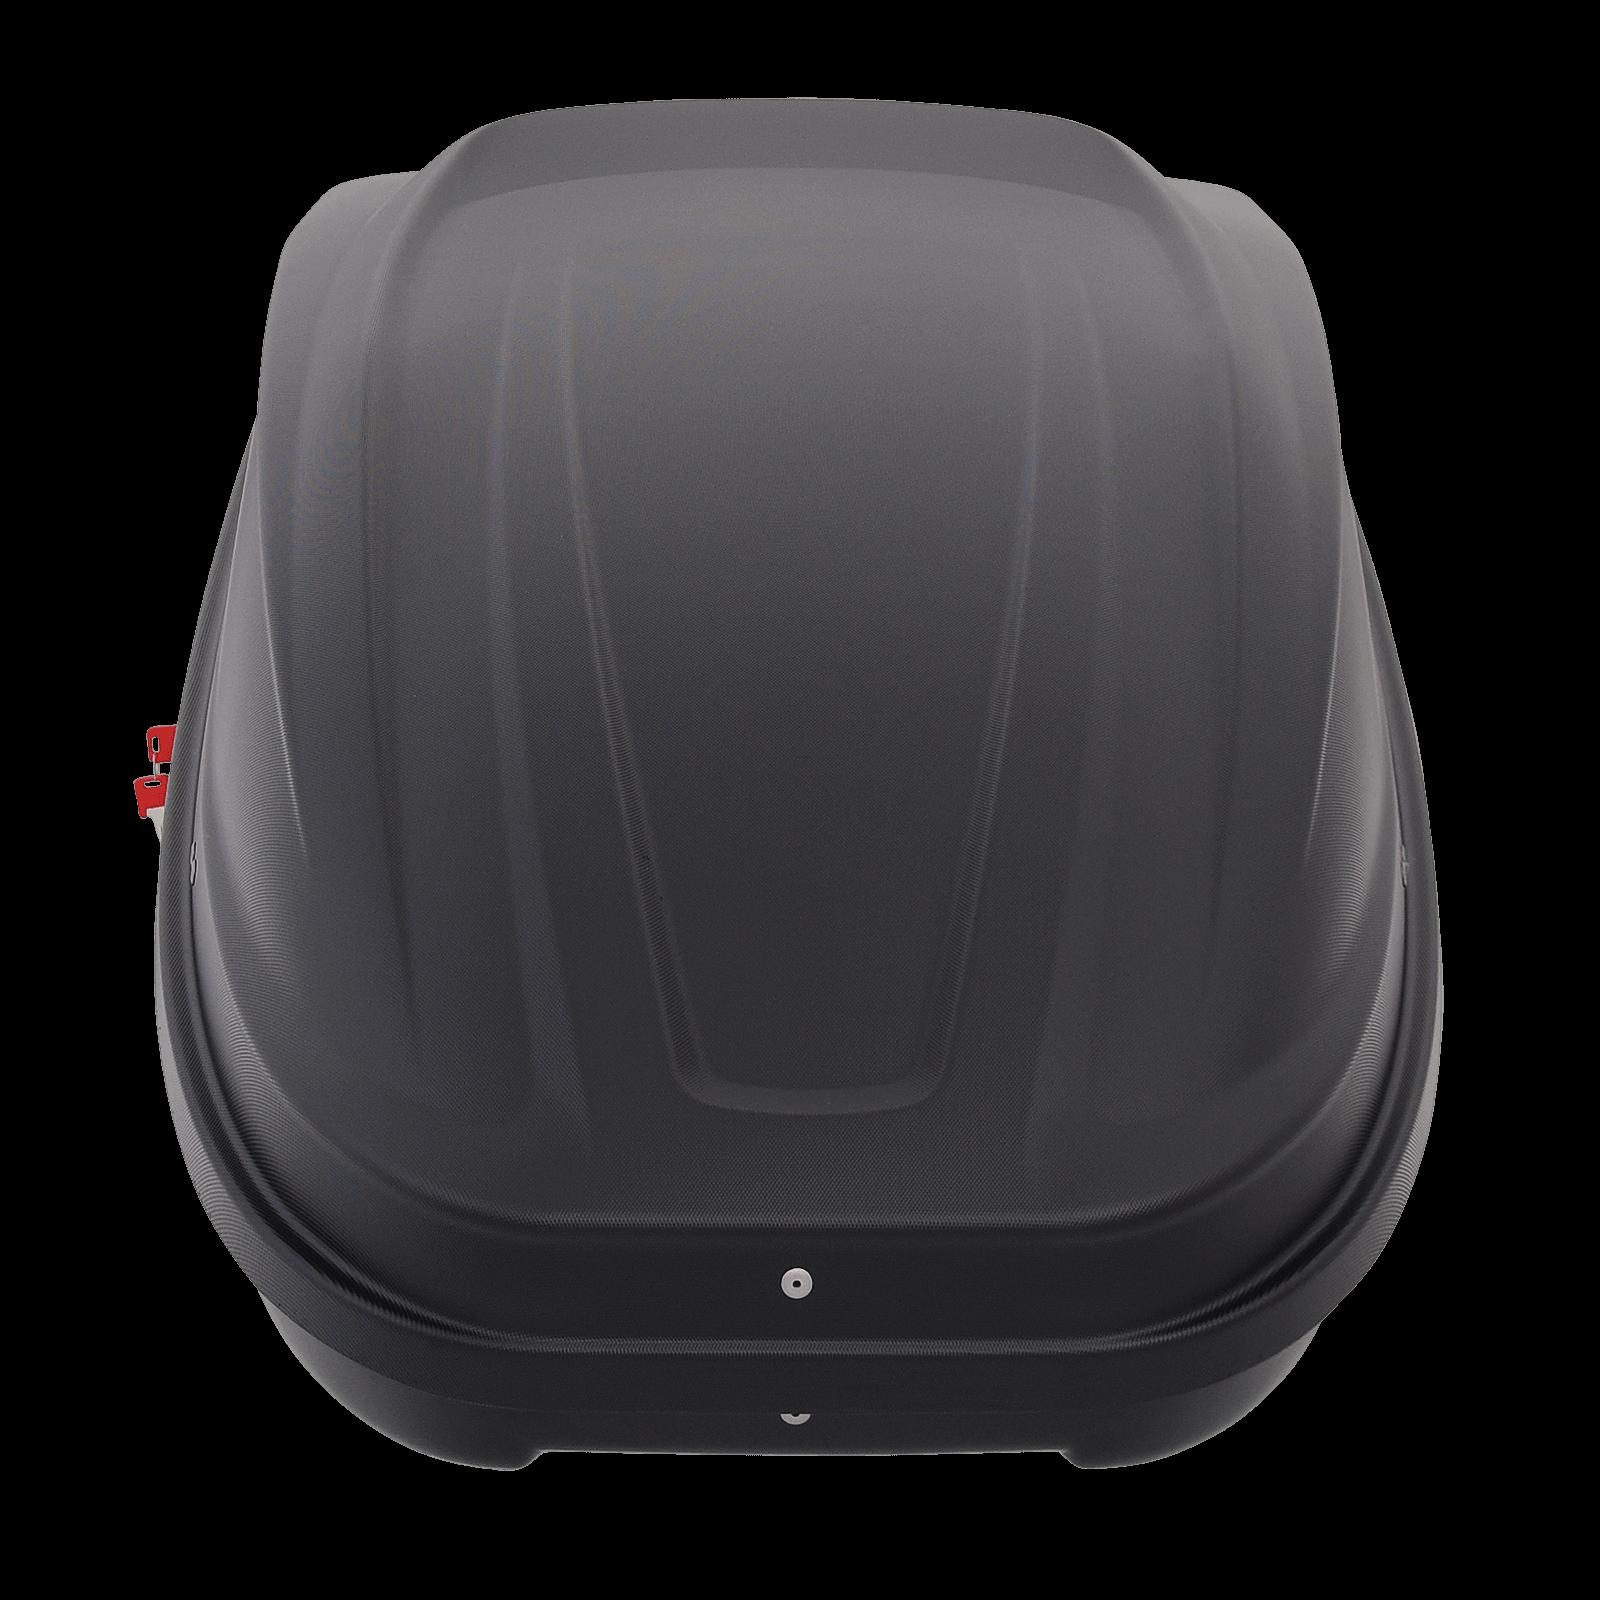 Dachbox G3 Spark 480 schwarz matt - Bild 3